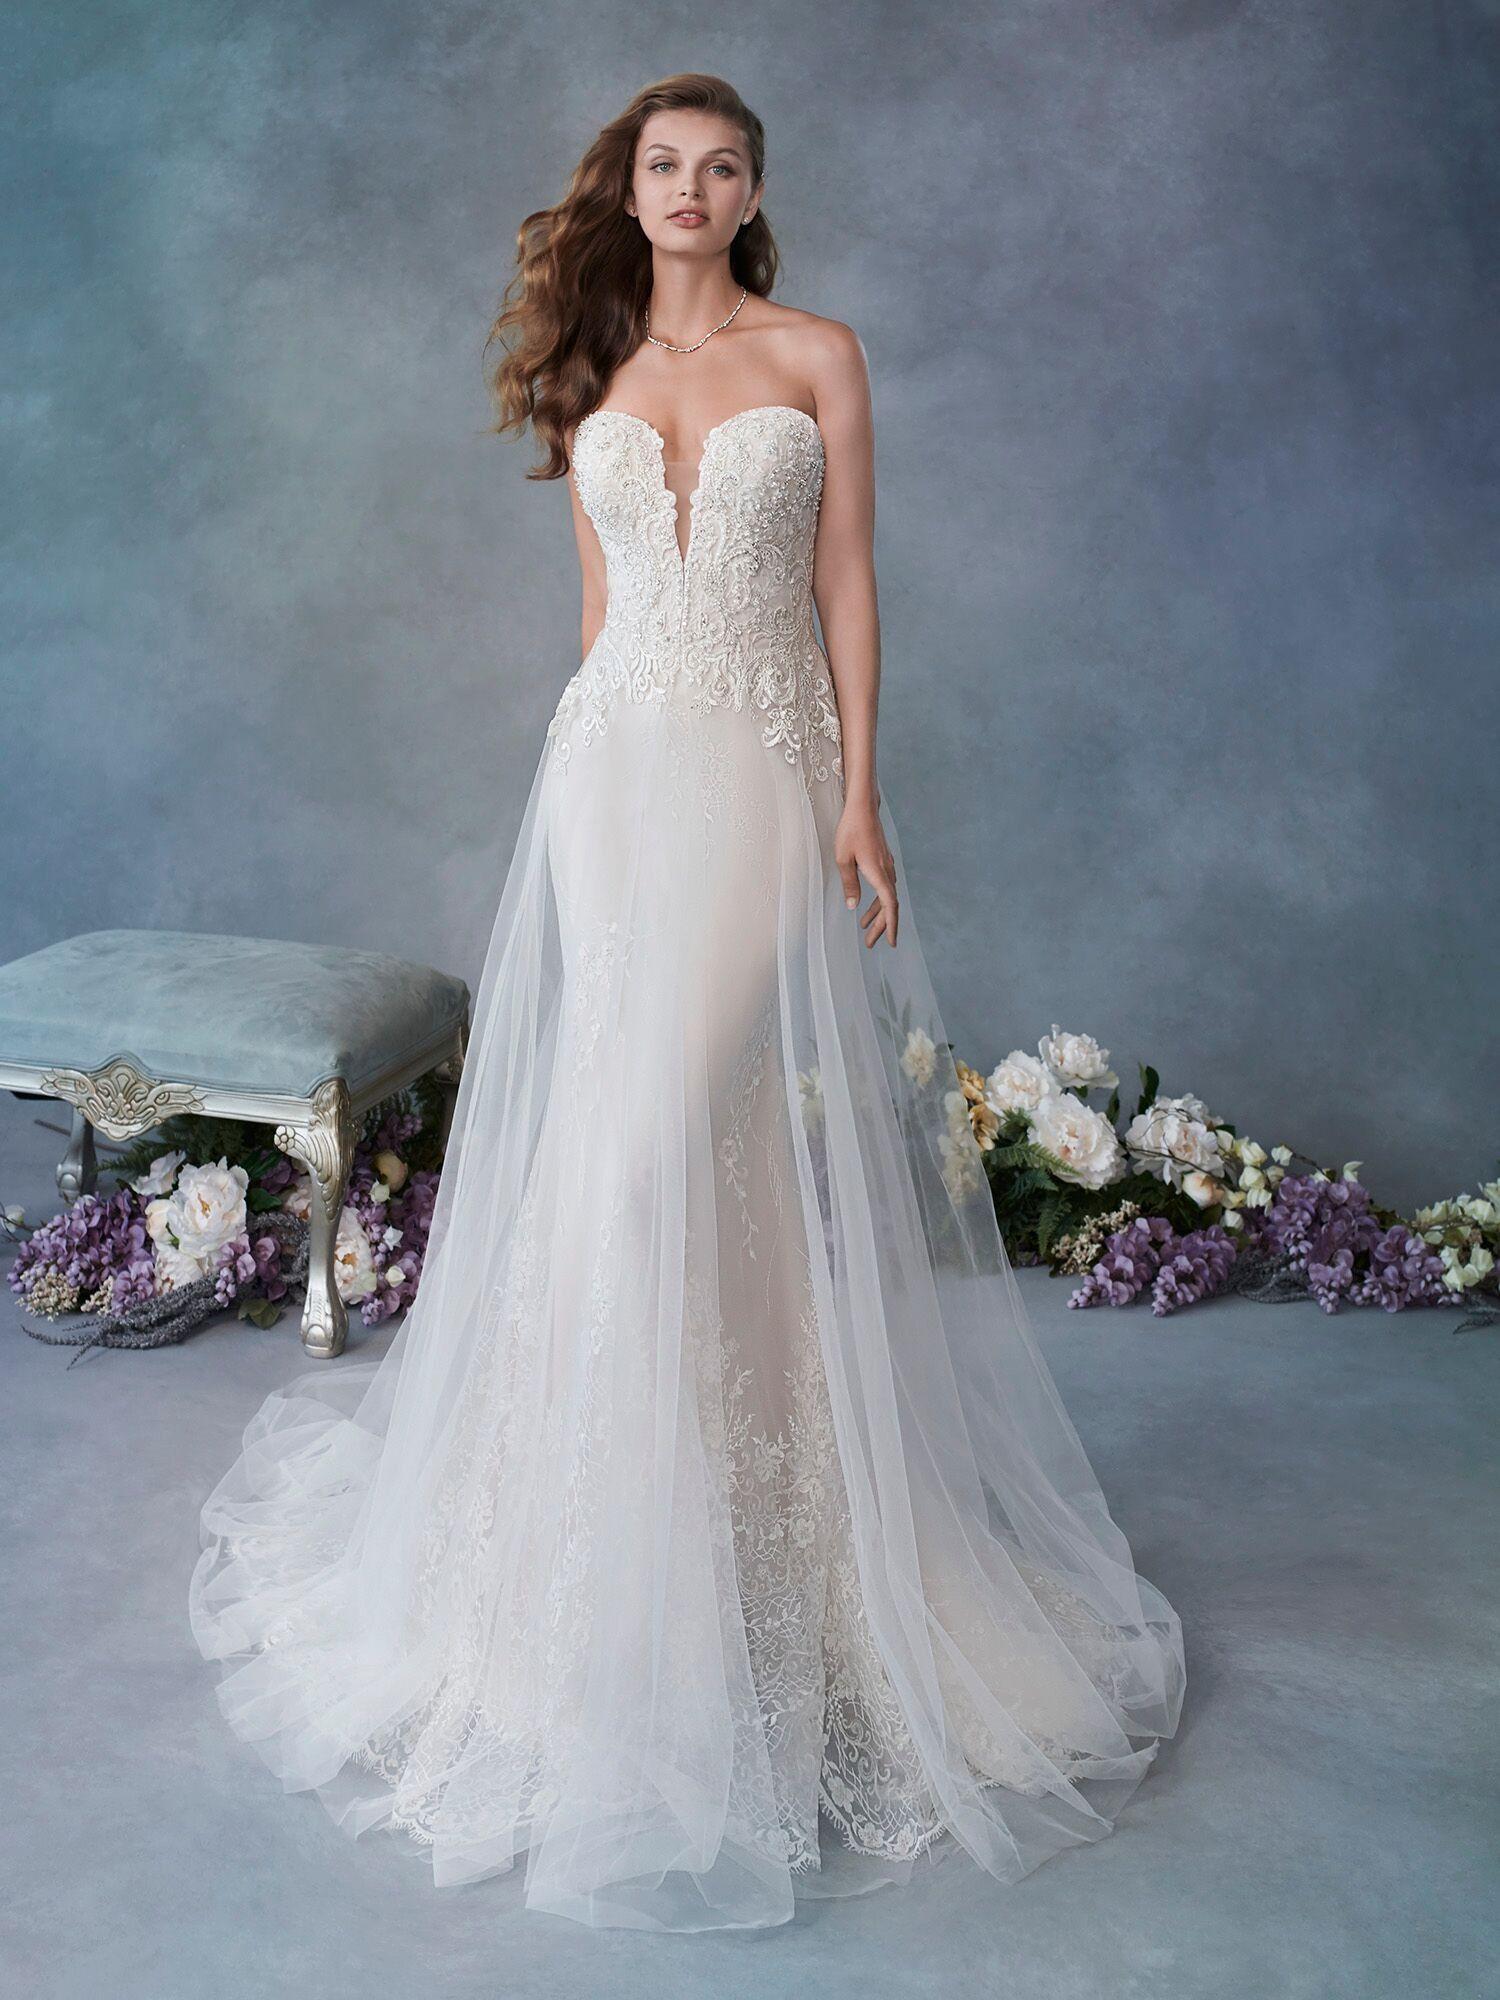 Unique lace over lace wedding dress. Mermaid bridal gown